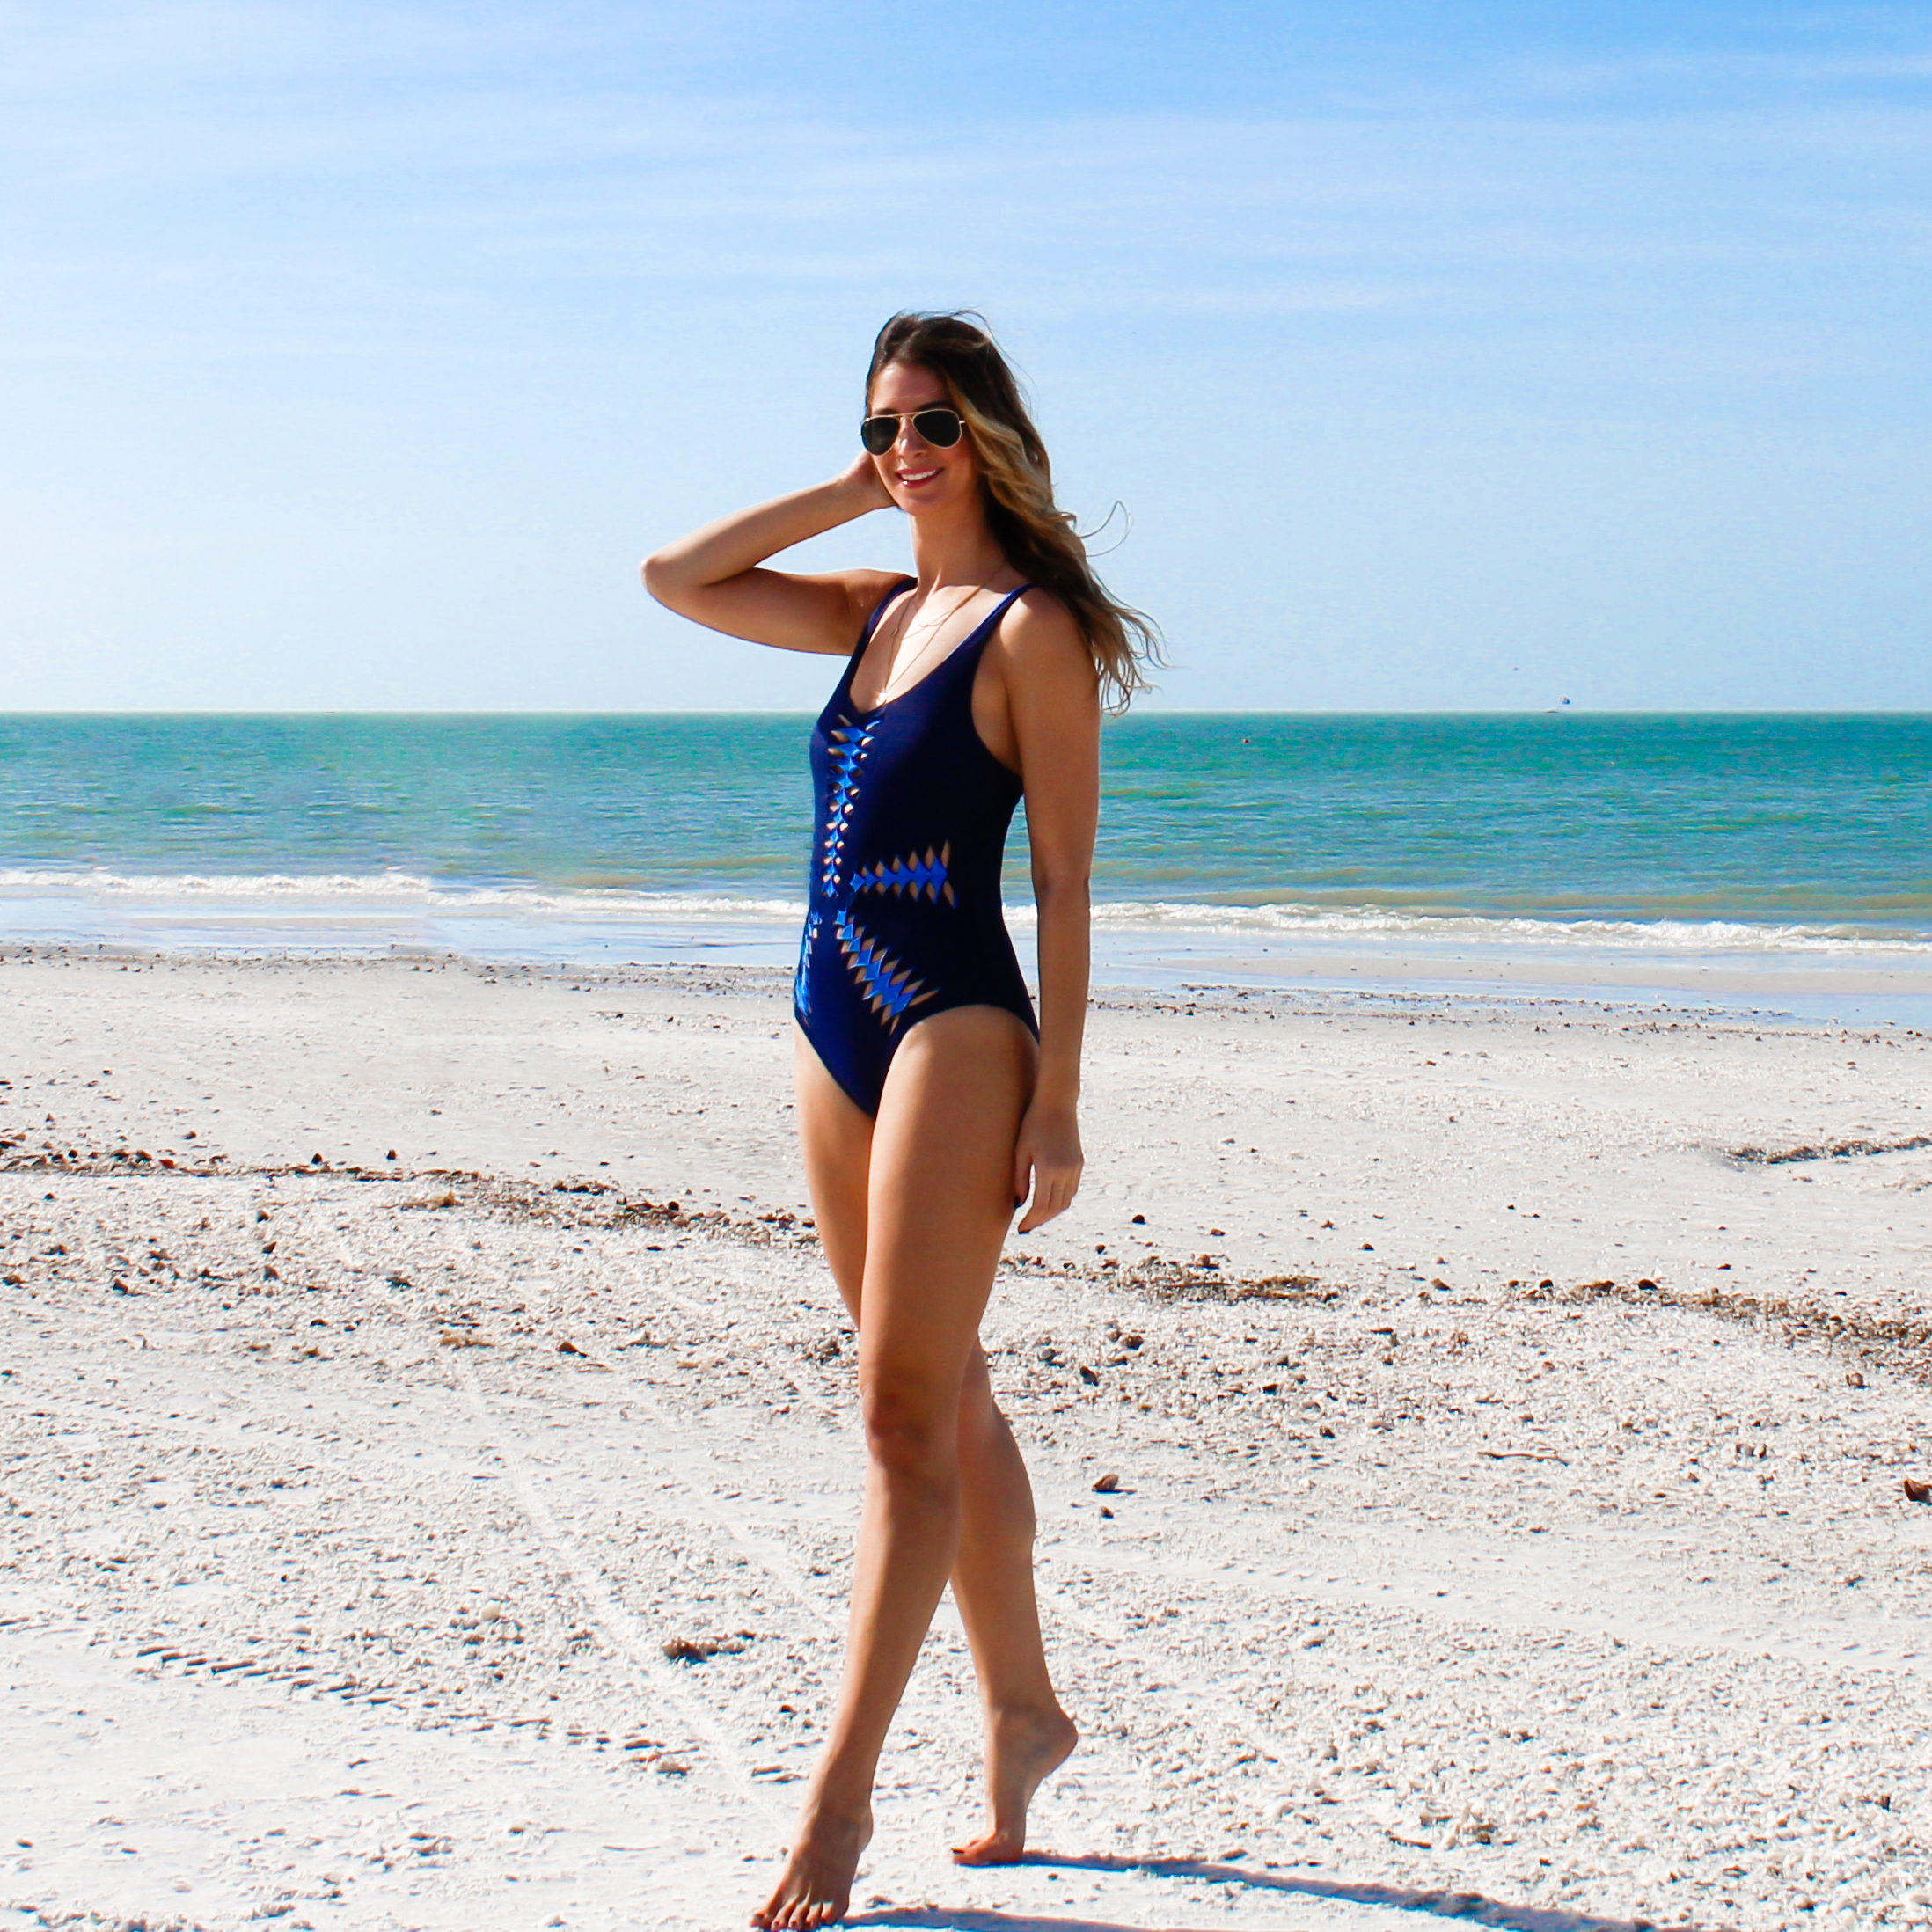 Swimsuit:  Becca  Sunglasses:  Ray Ban